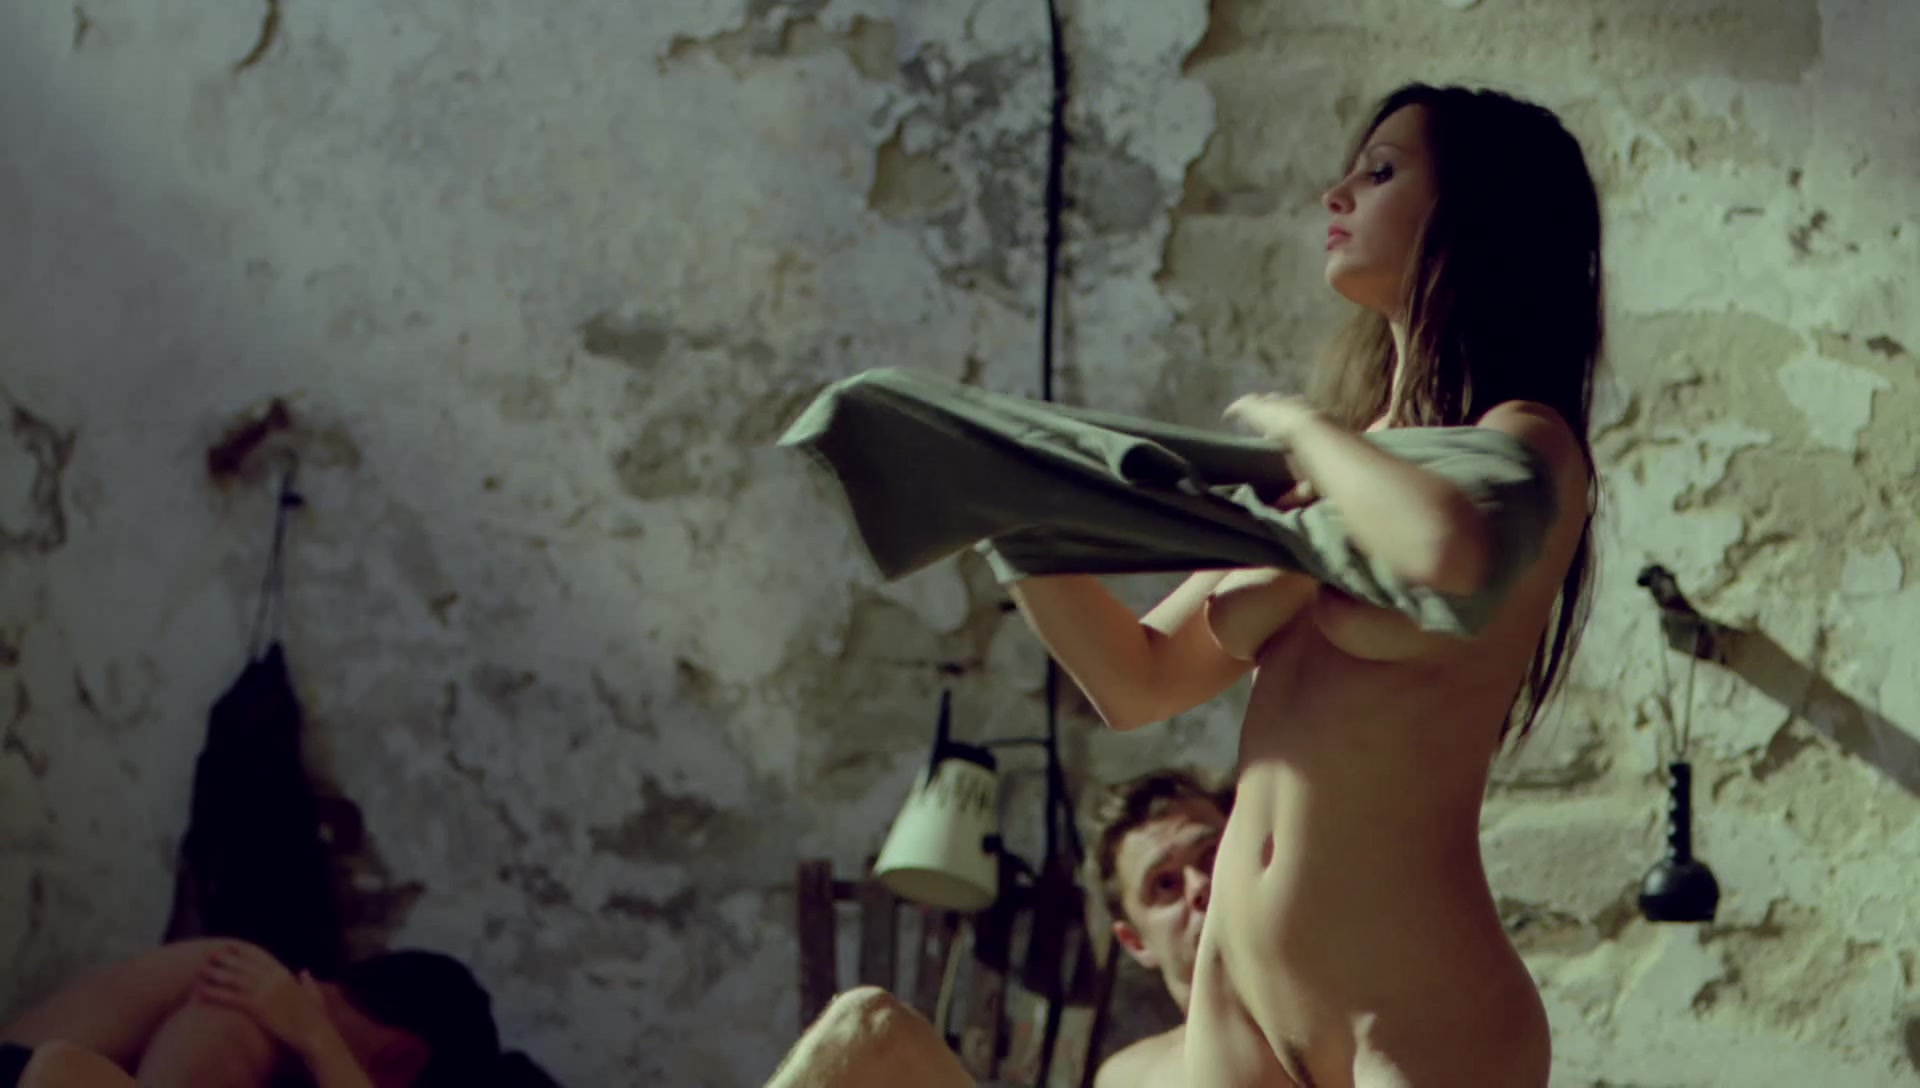 nude vagina pic